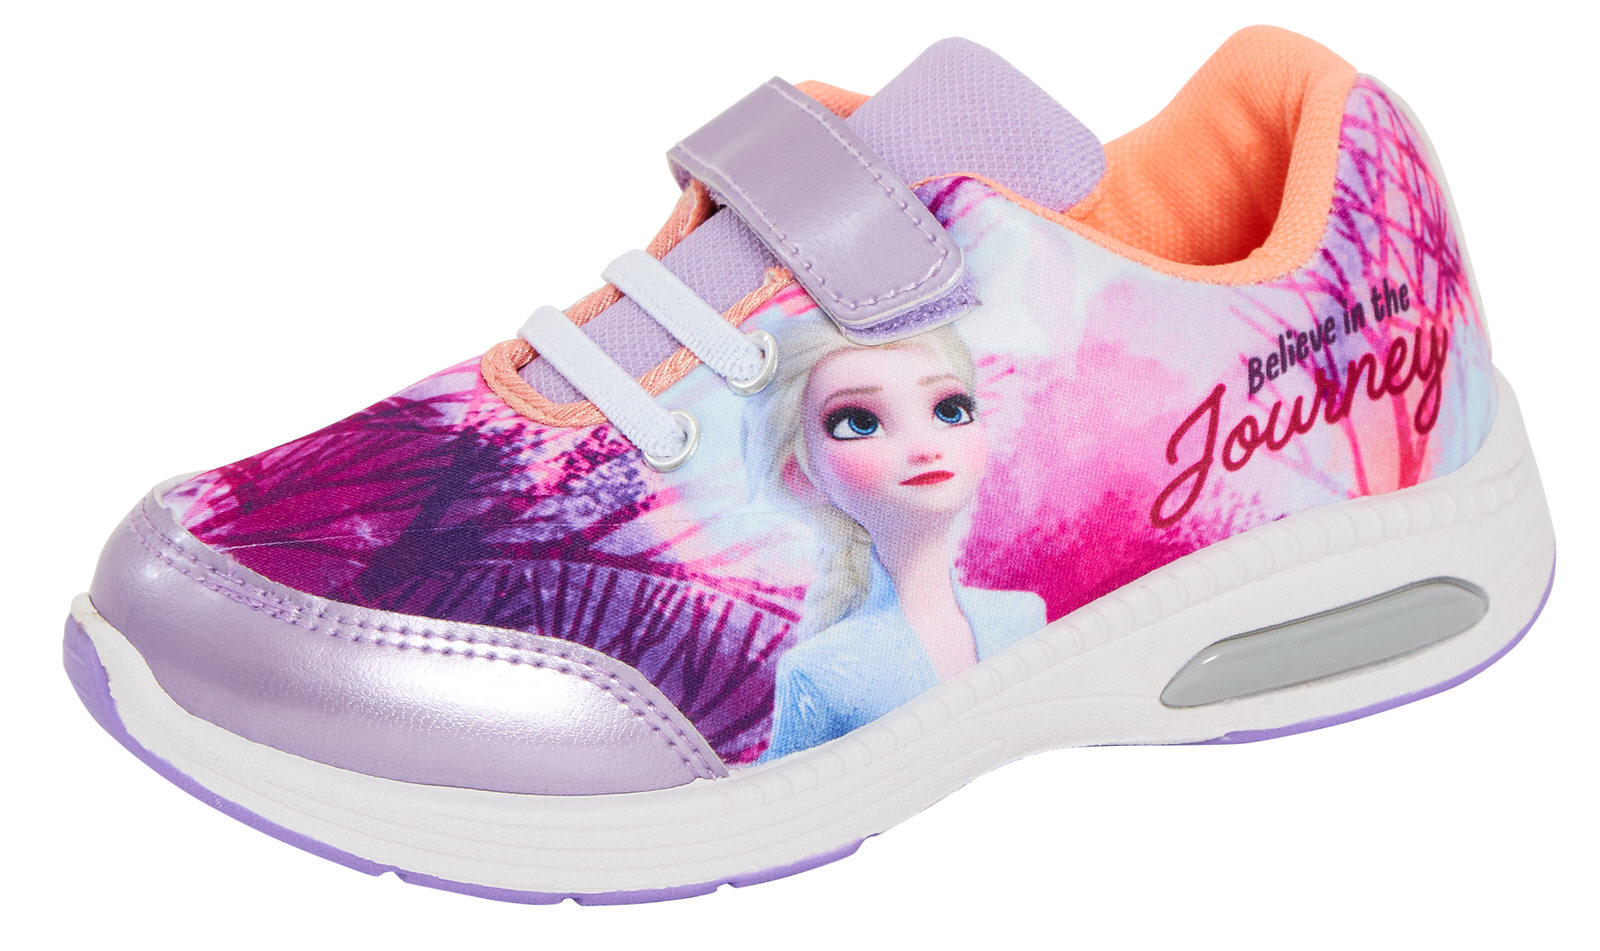 Girls Disney Frozen 2 Light Up Trainers